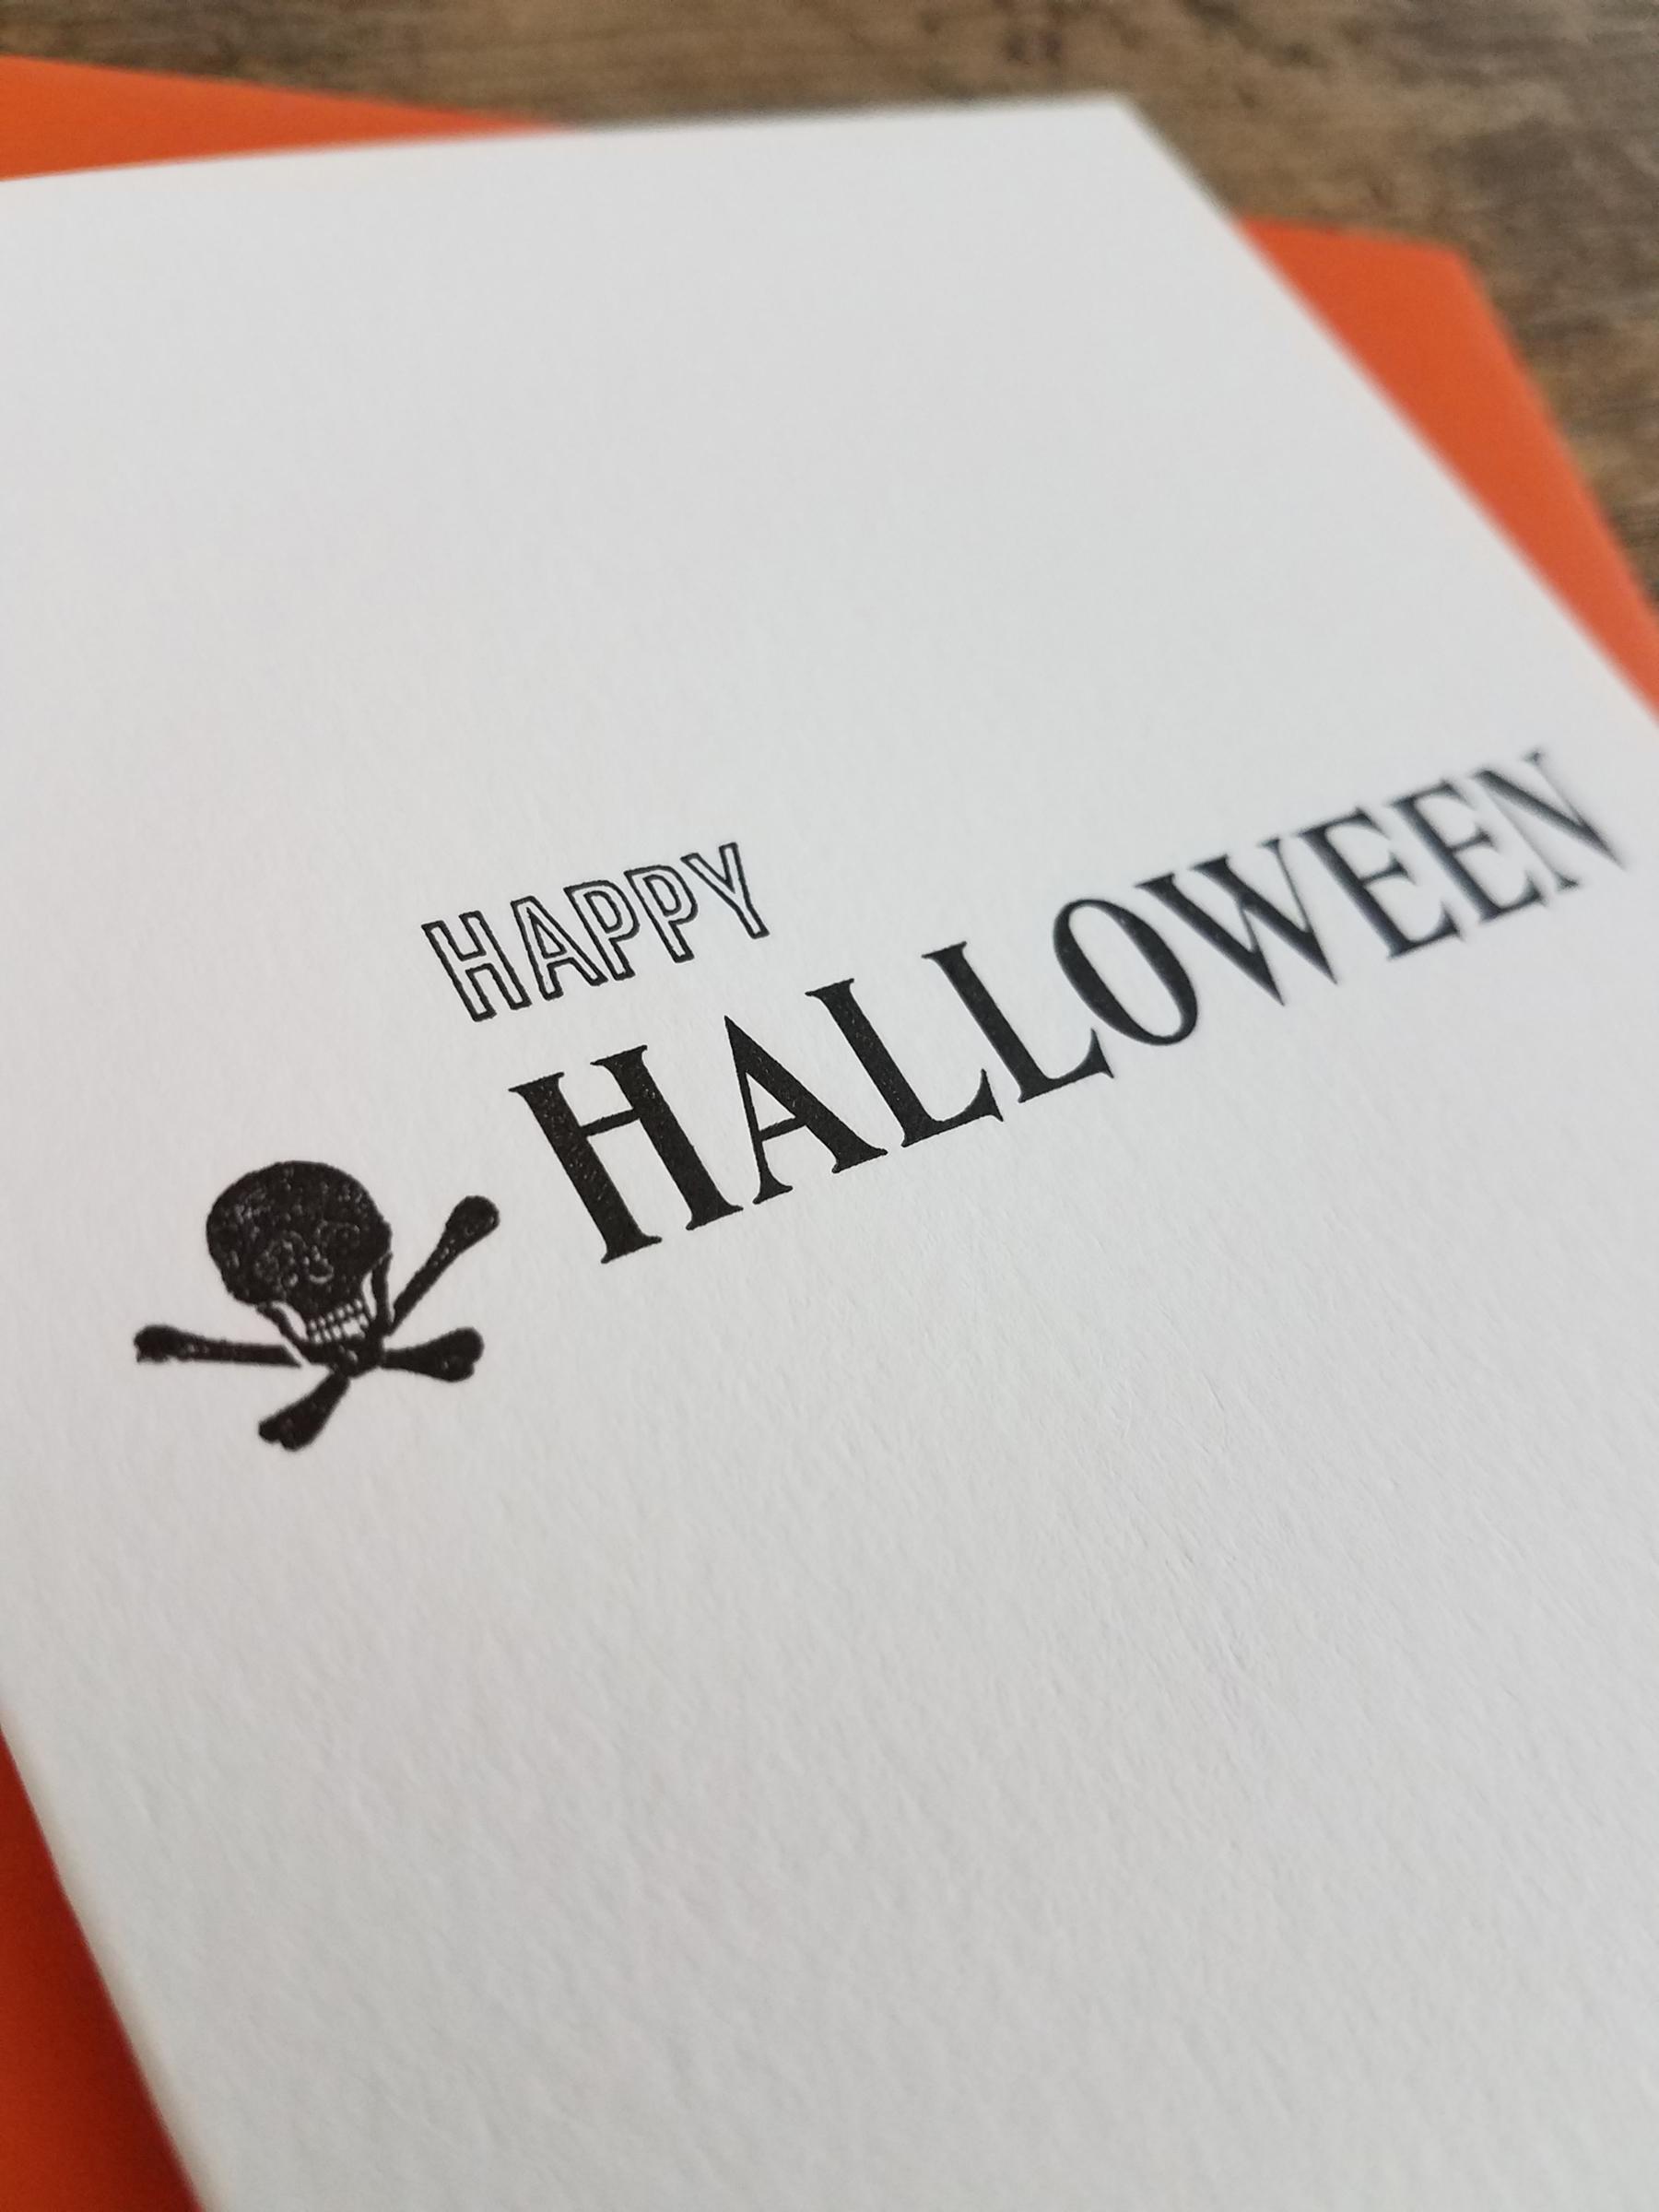 Happy halloween letterpress greeting card iron leaf press home greeting cards holiday happy halloween letterpress greeting card kristyandbryce Images